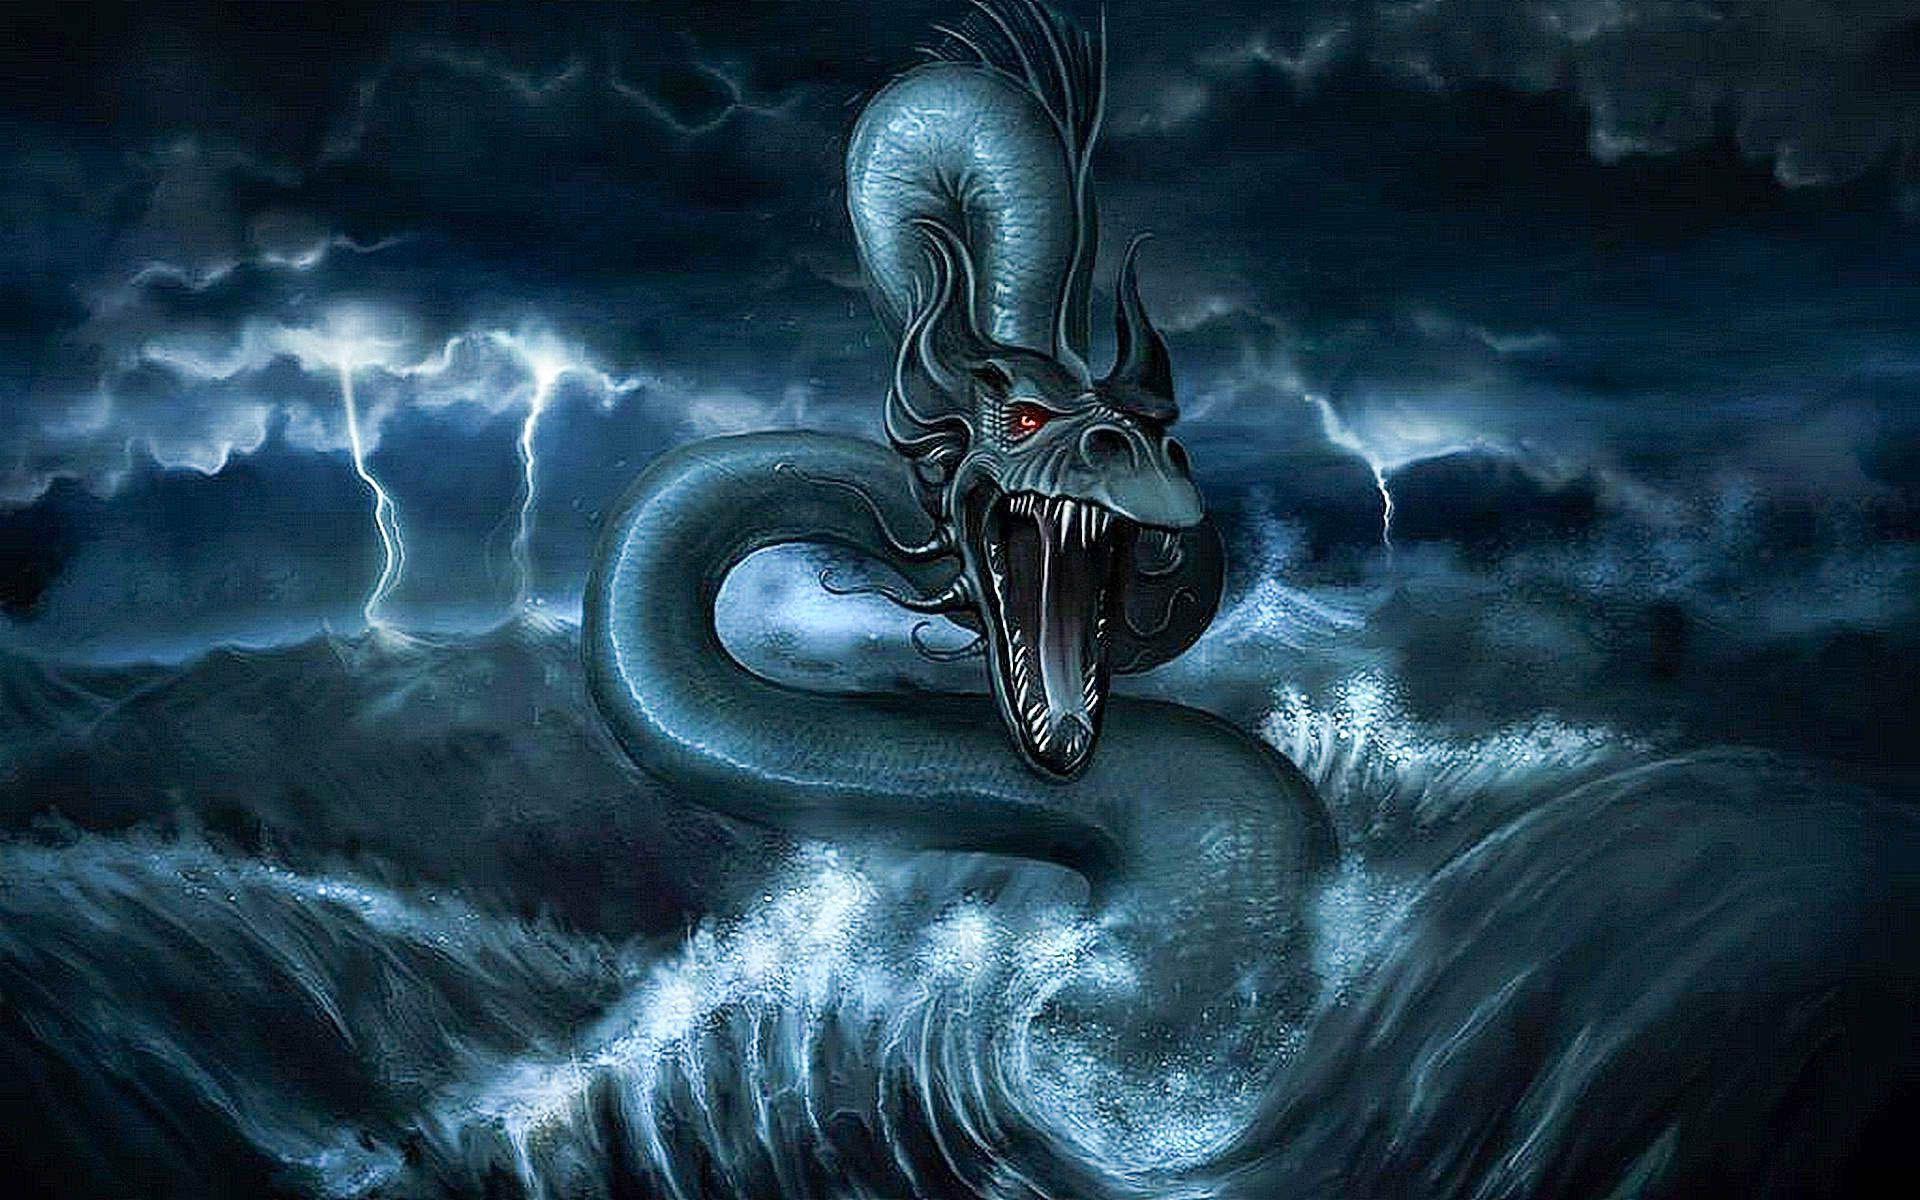 Sea Monster Wallpaper Photo Sea Monsters Photo Wallpaper